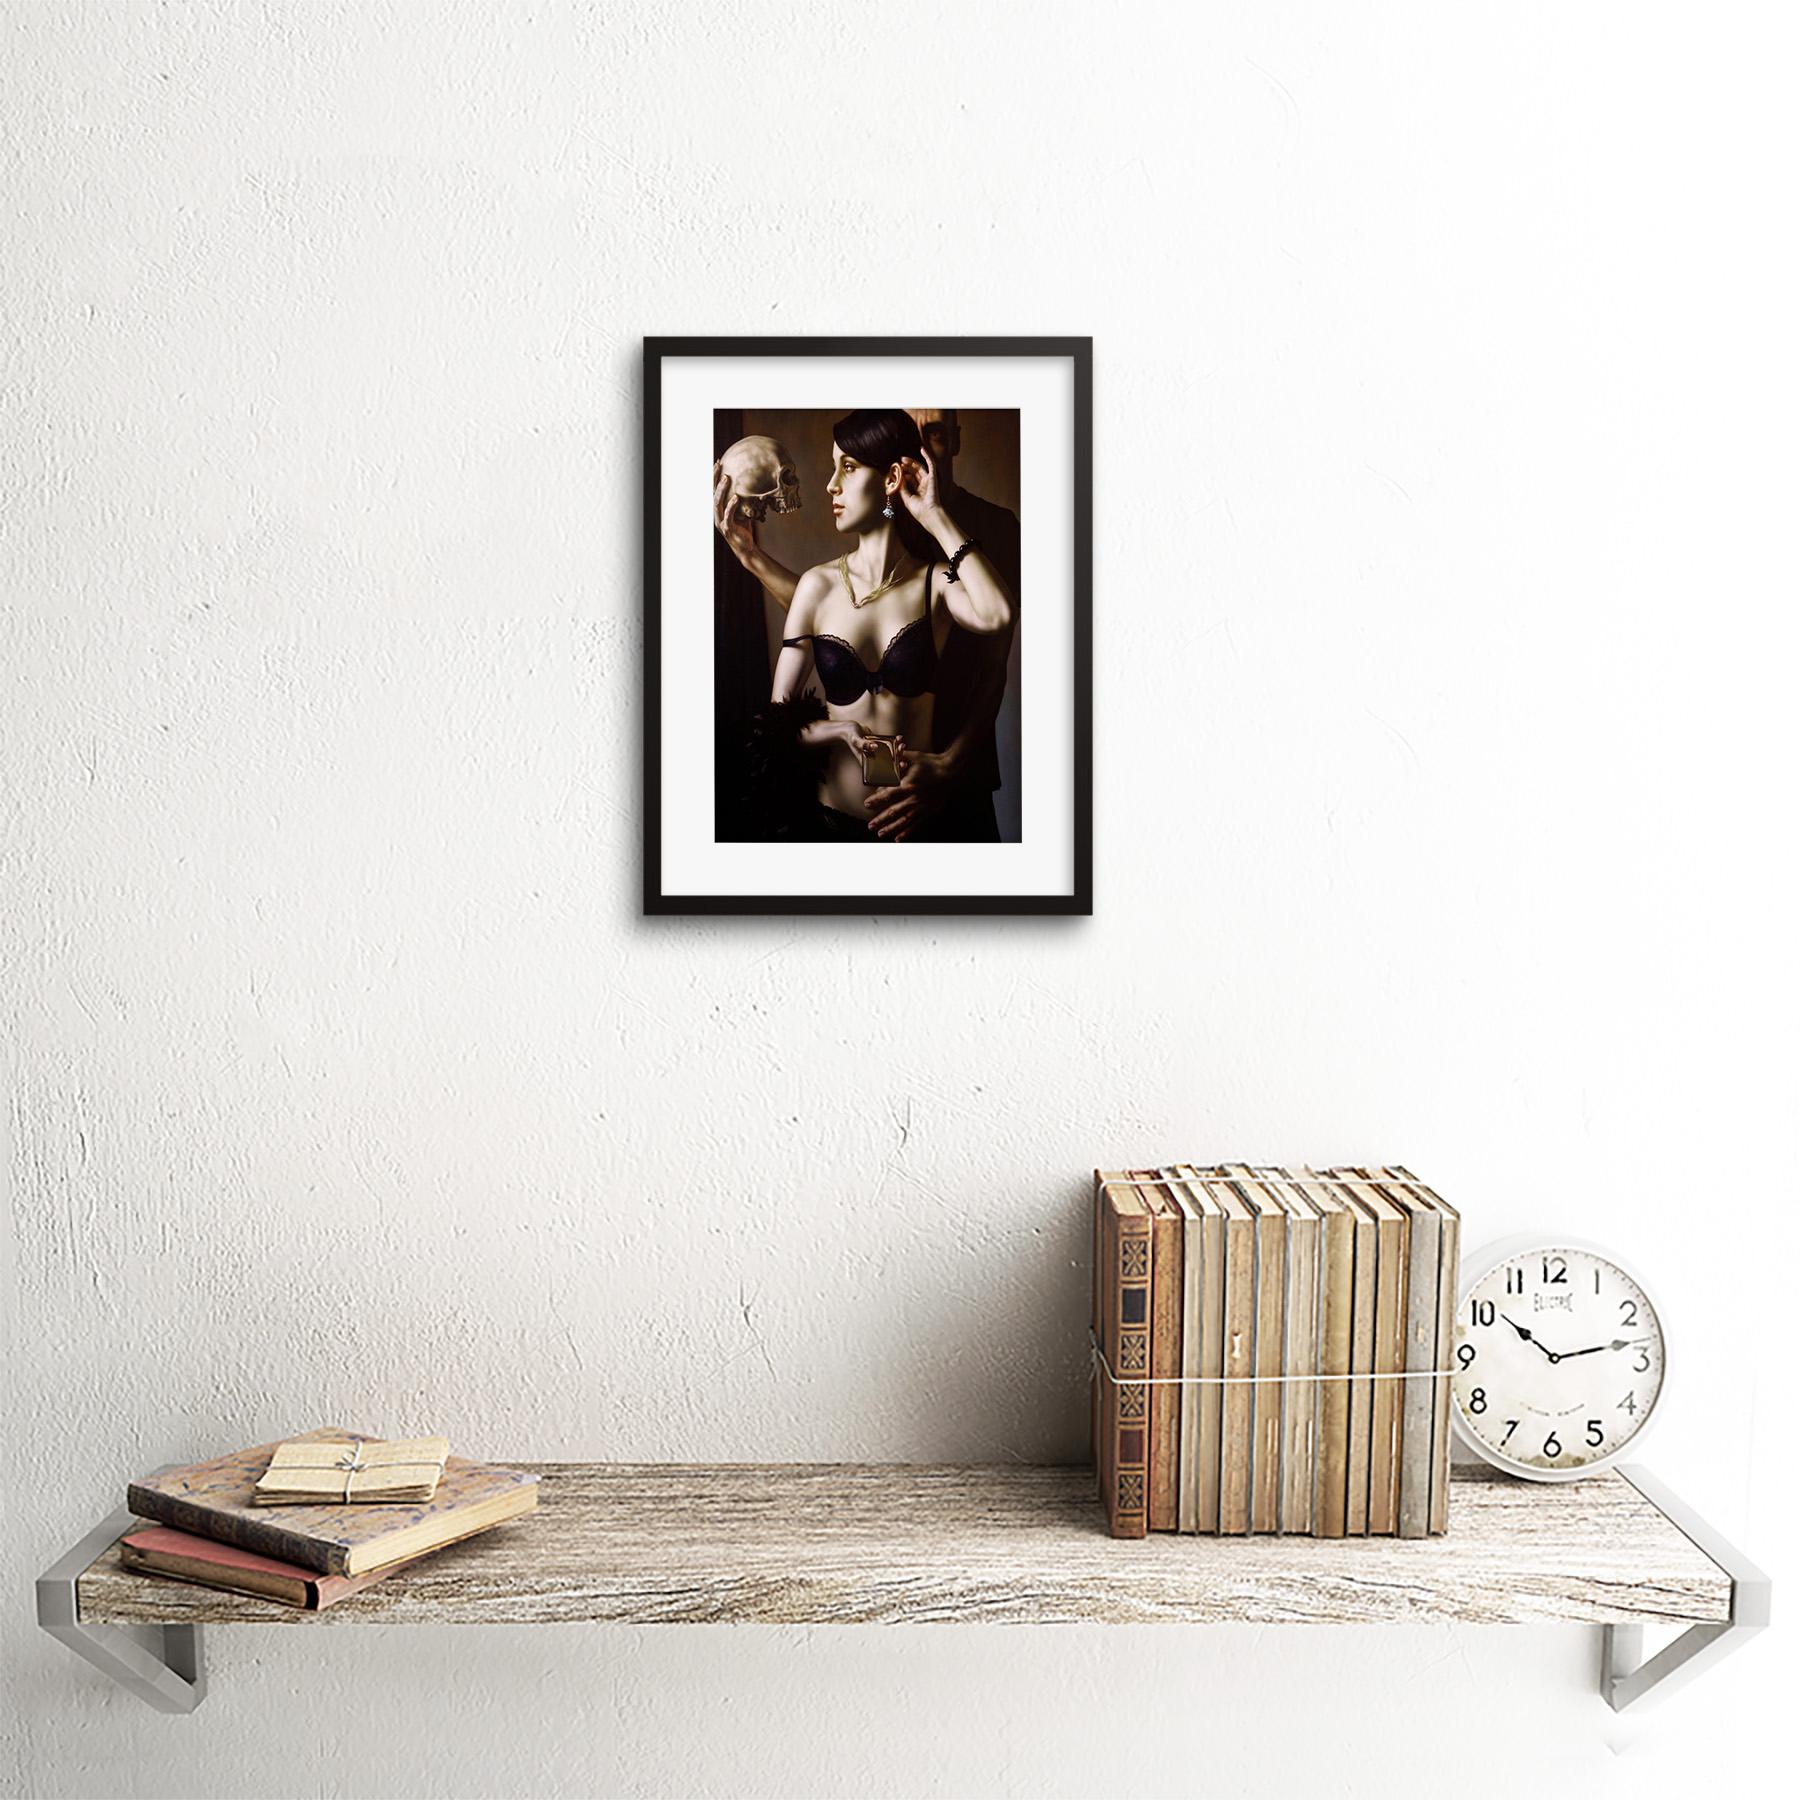 Painting-Balcar-Send-Me-To-The-Future-Framed-Art-Print-9x7-Inch 縮圖 3